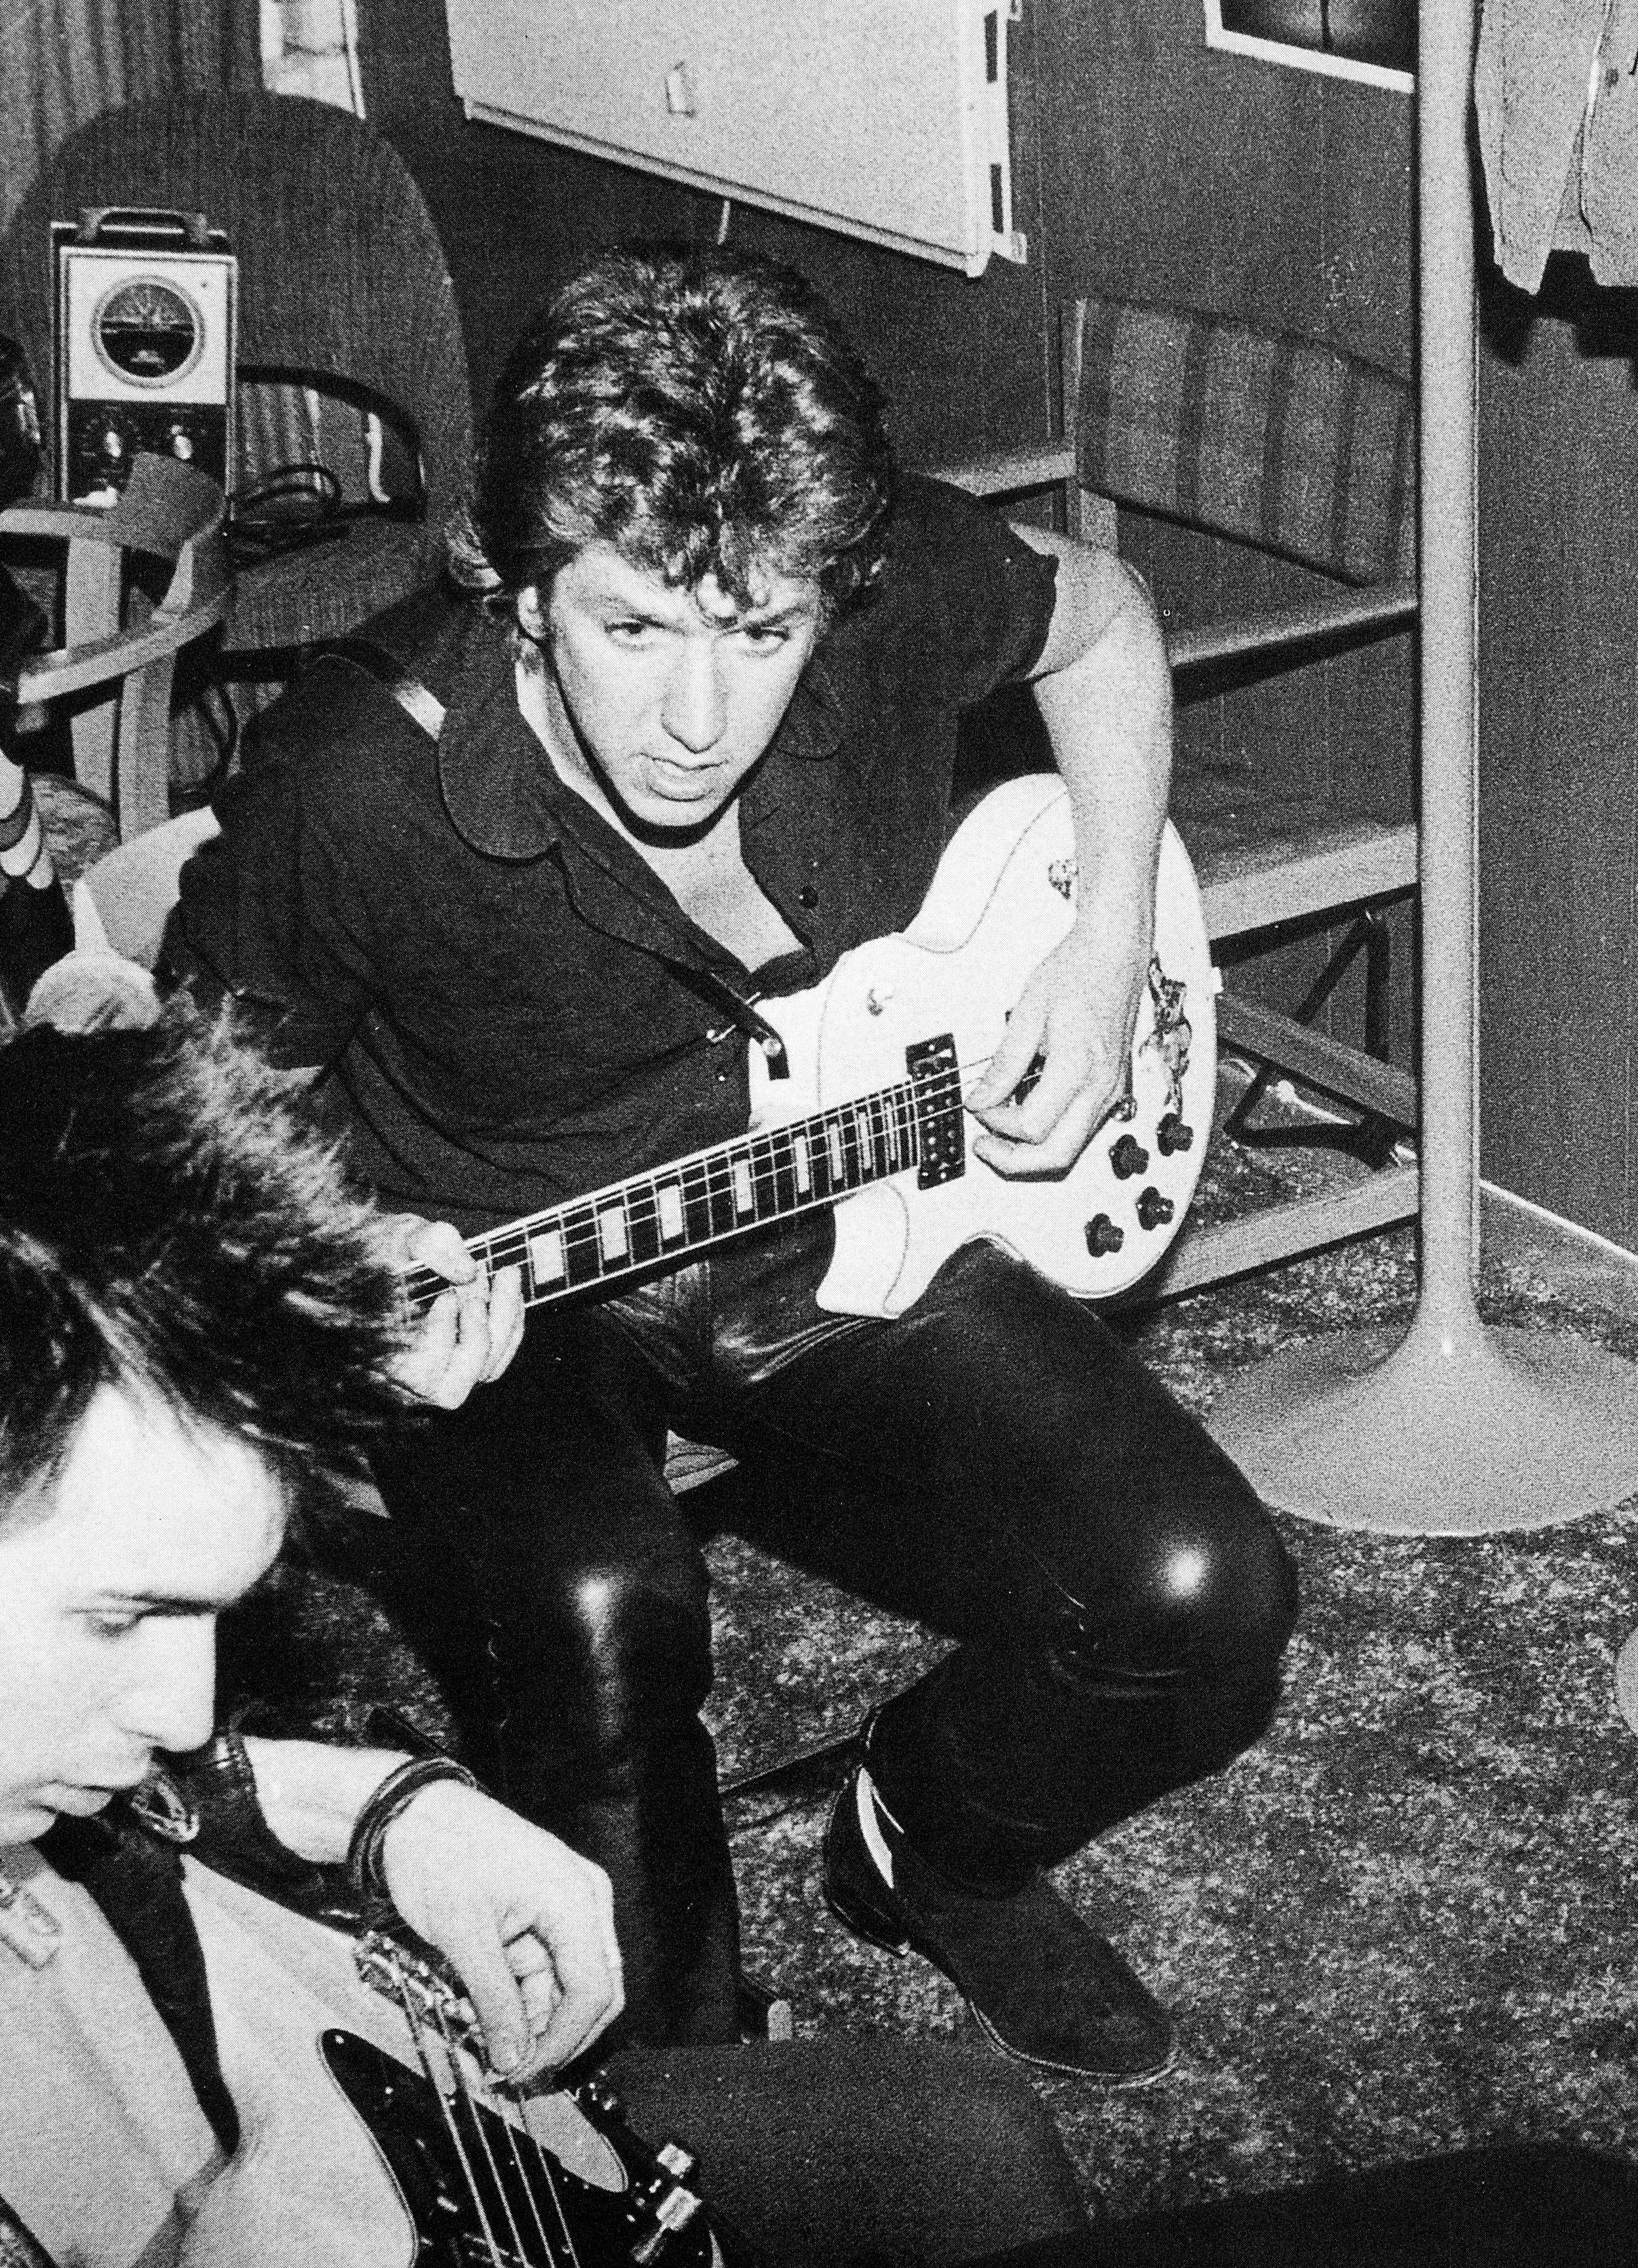 Steve Jones of the The Sex Pistols